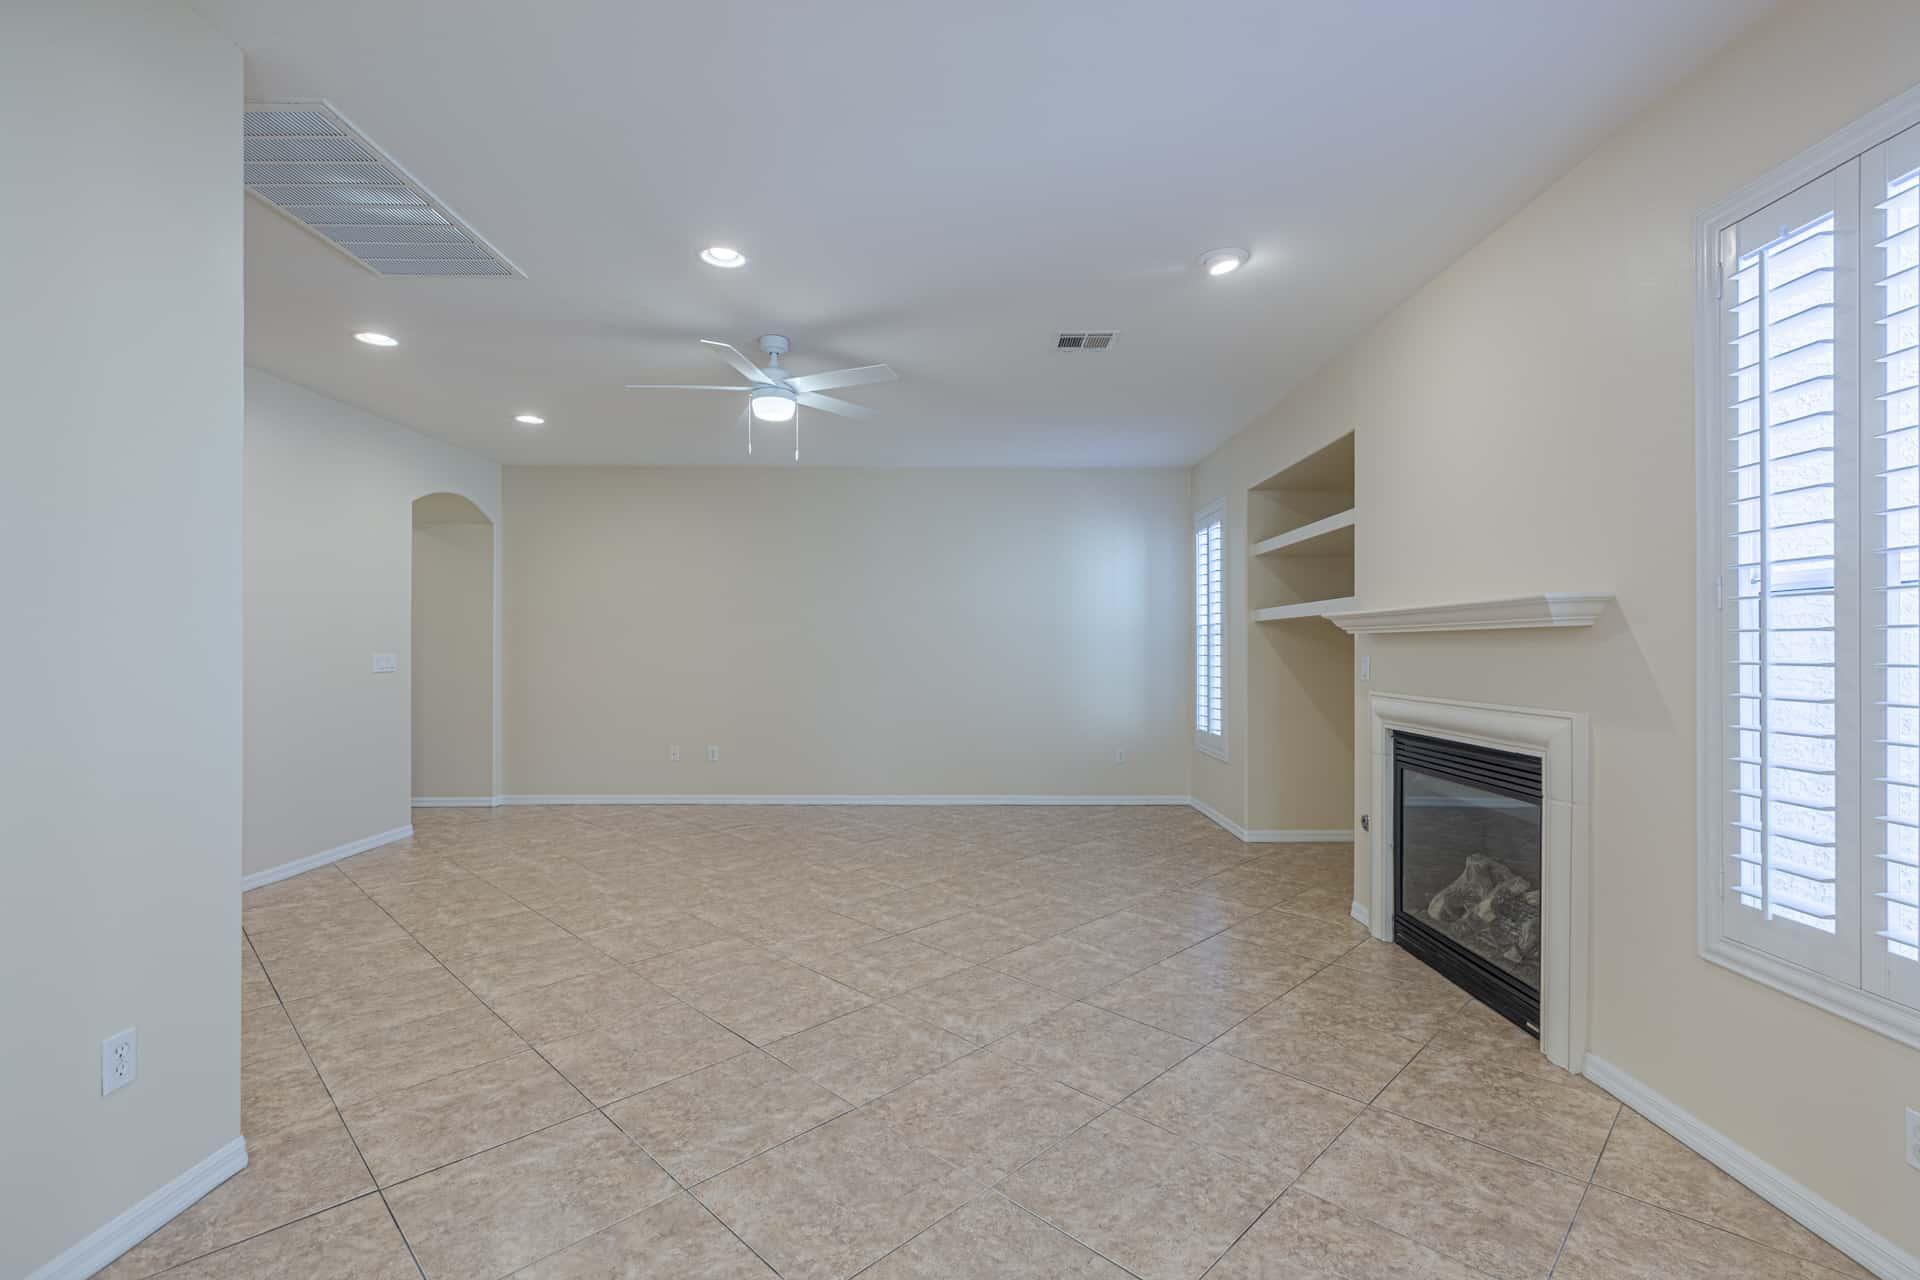 las-vegas-luxry-real-estate-realtor-rob-jensen-company-10729-grey-havens-court-willow-creek2057